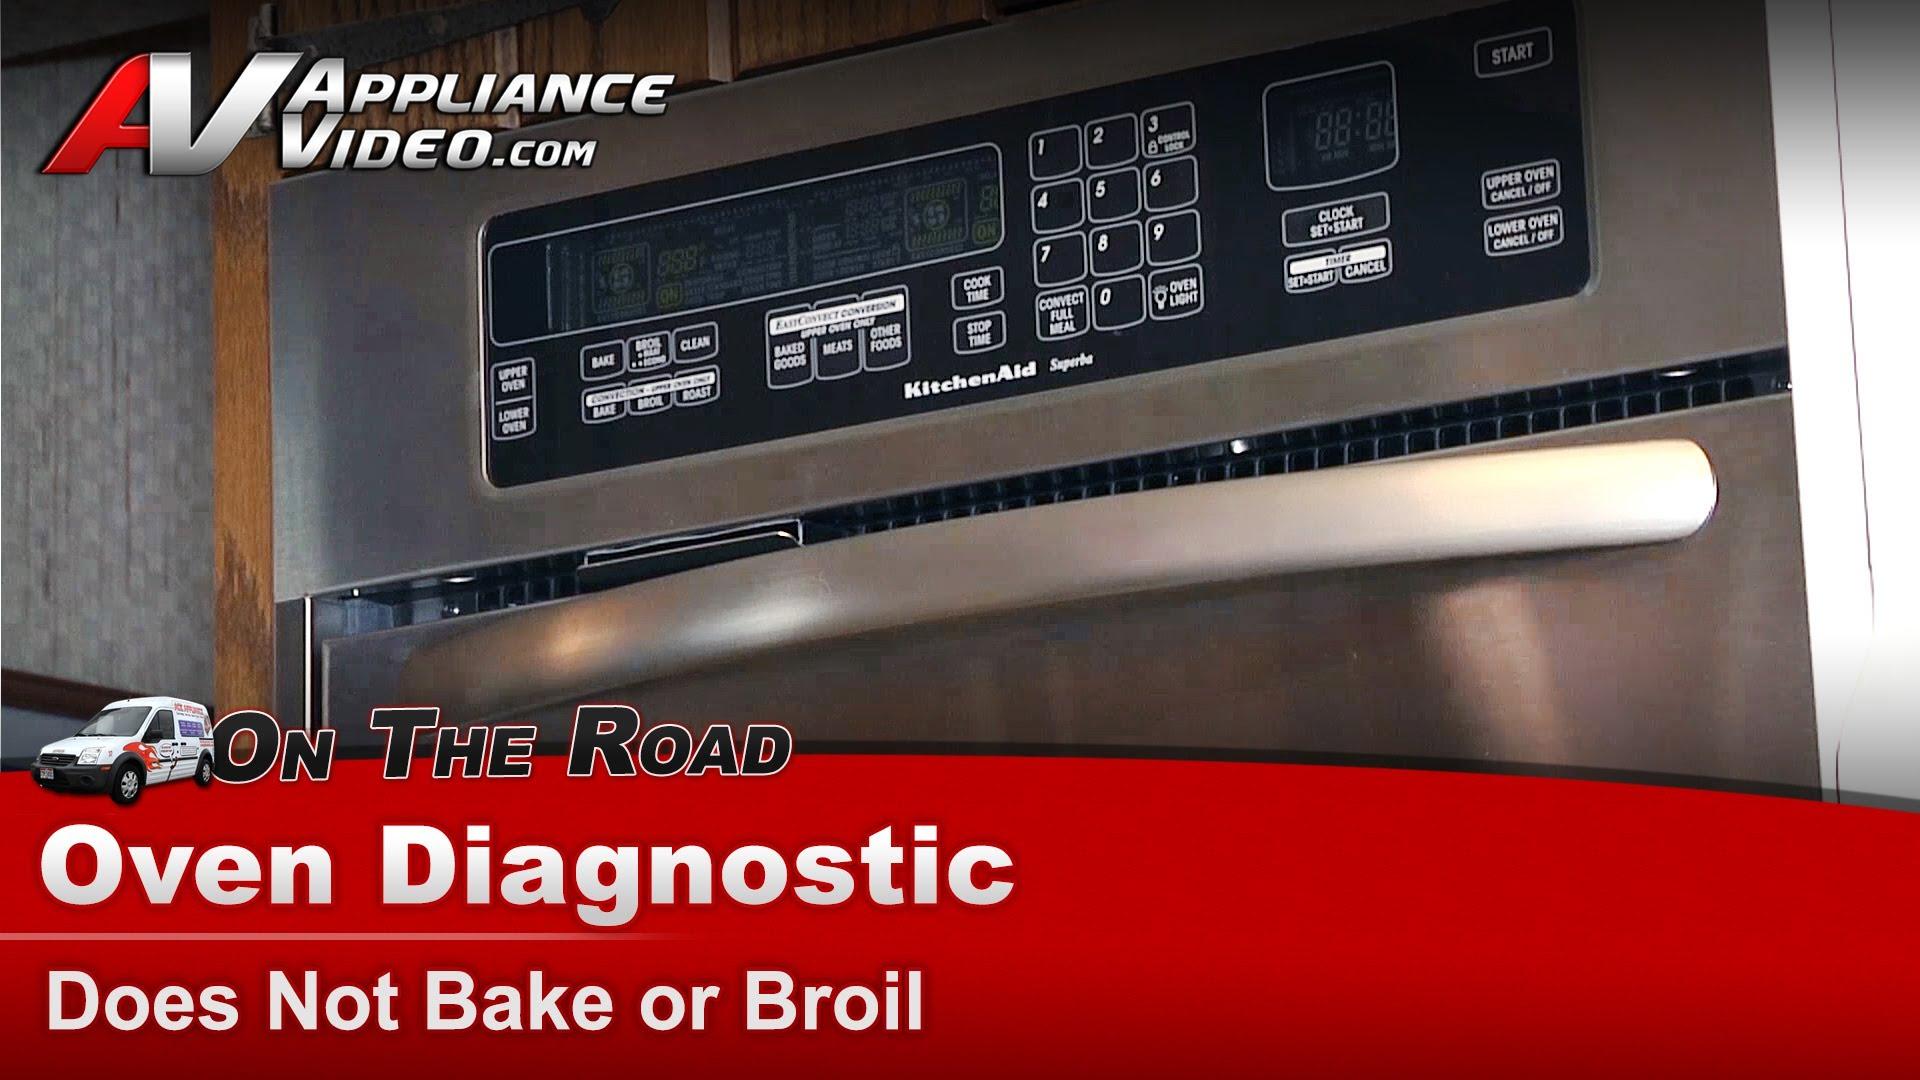 Kitchenaid Kebc247vss02 Oven Diagnostic Does Not Bake Or